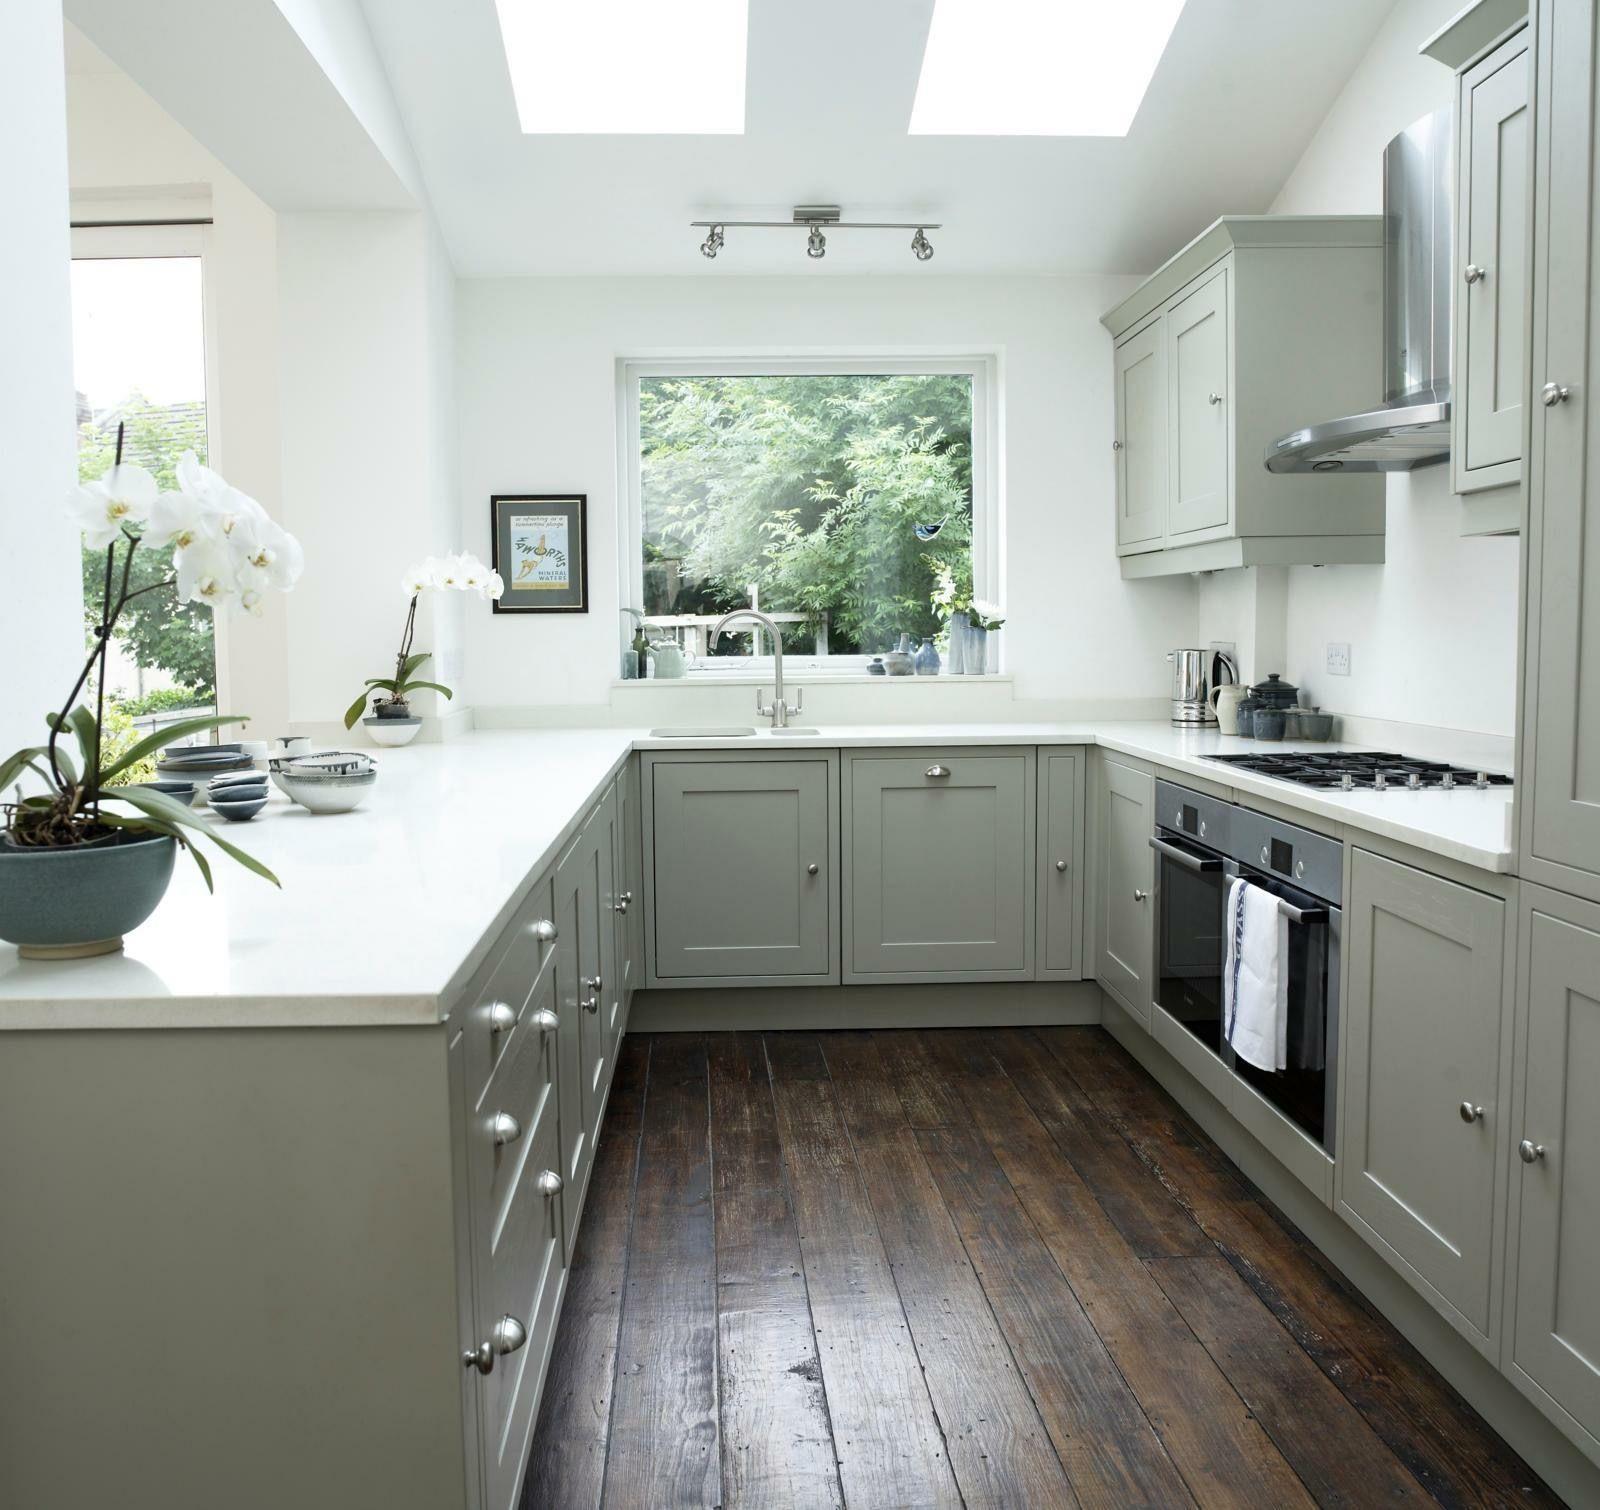 Pin By Pilar Mejia On Cocinas 1115 Kitchen Interior Shaker Style Kitchens Kitchen Design